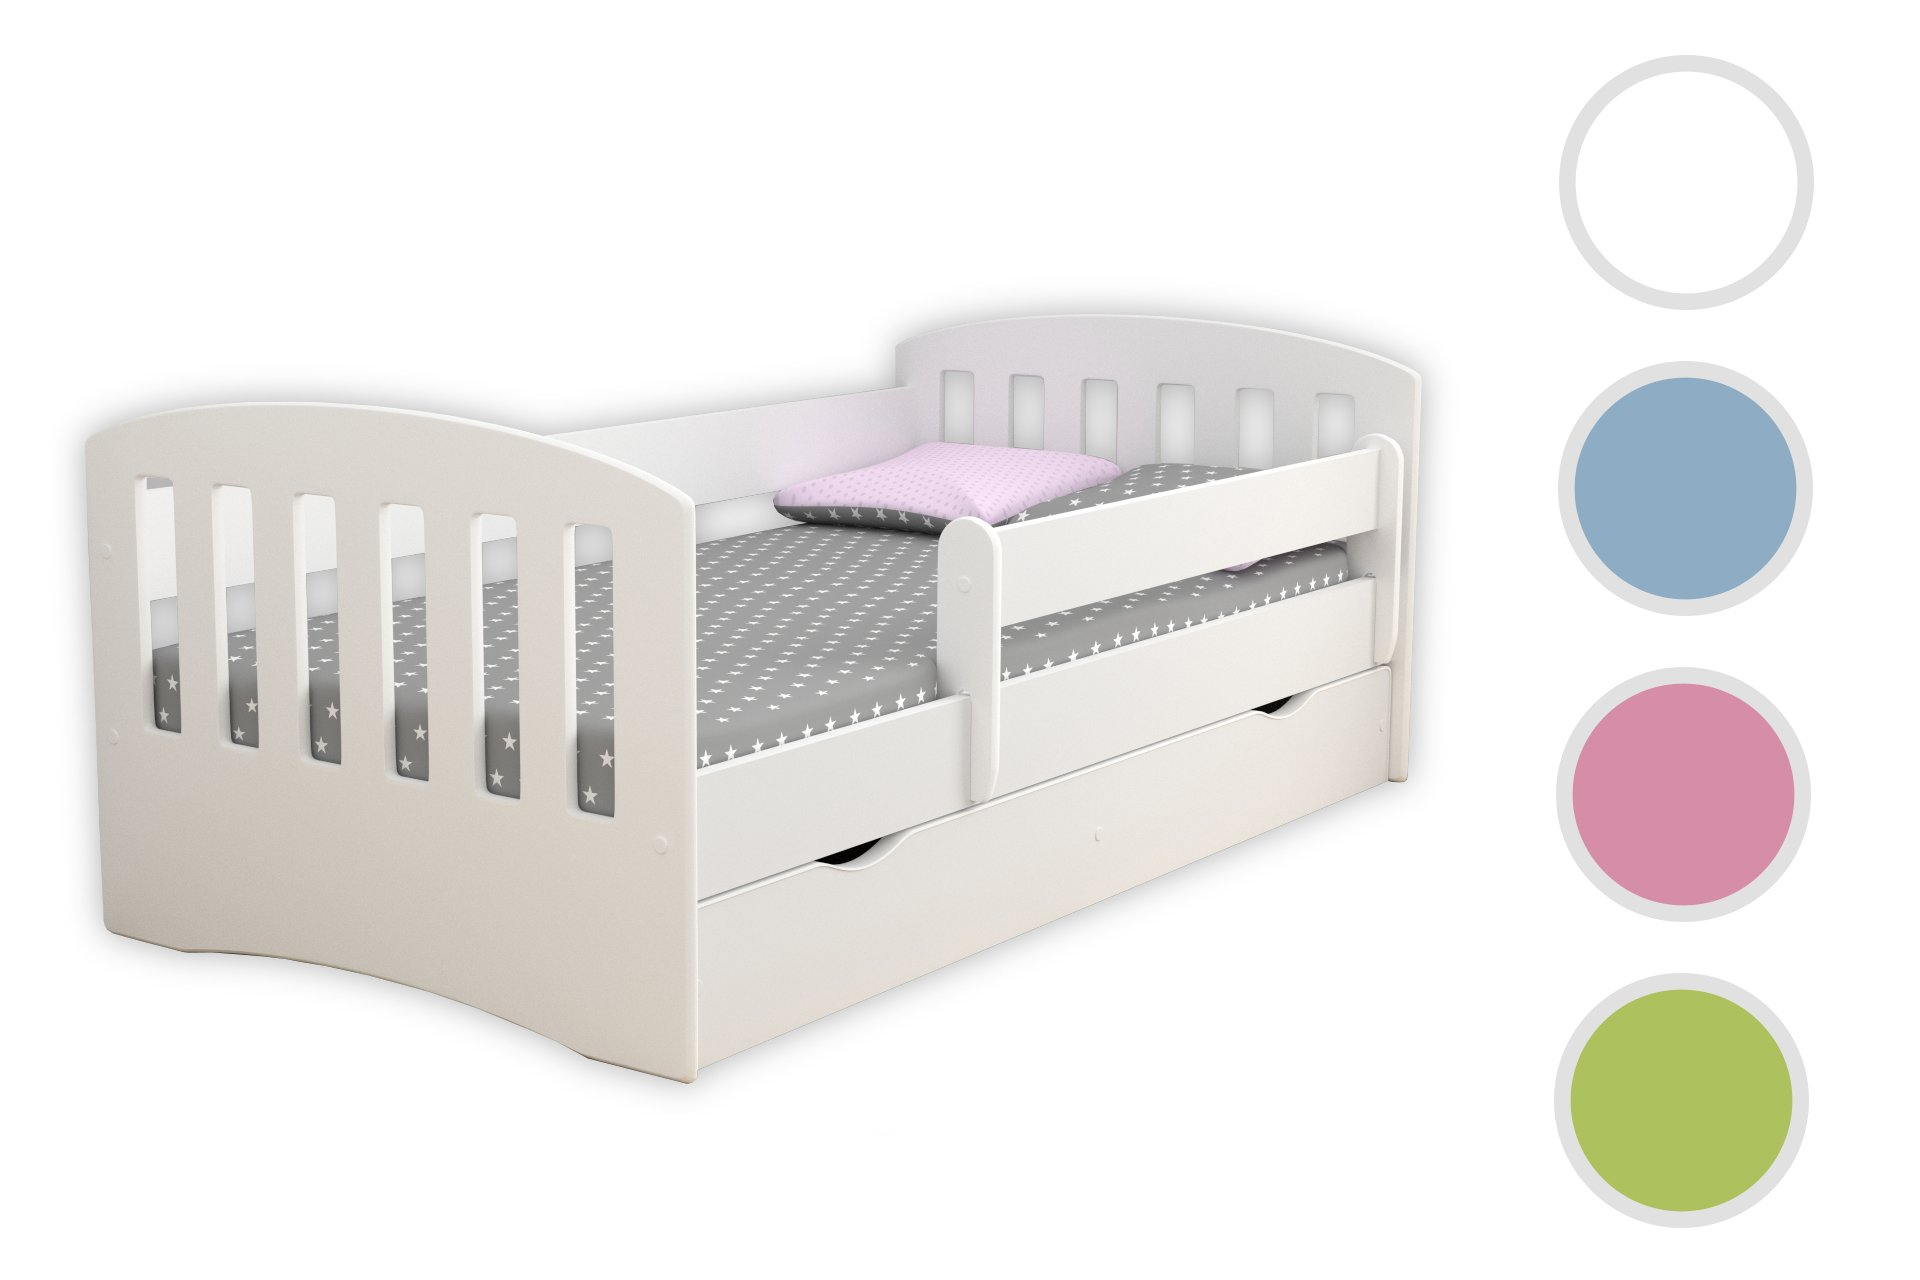 Full Size of Kinderbett Mädchen Betten Bett Wohnzimmer Kinderbett Mädchen